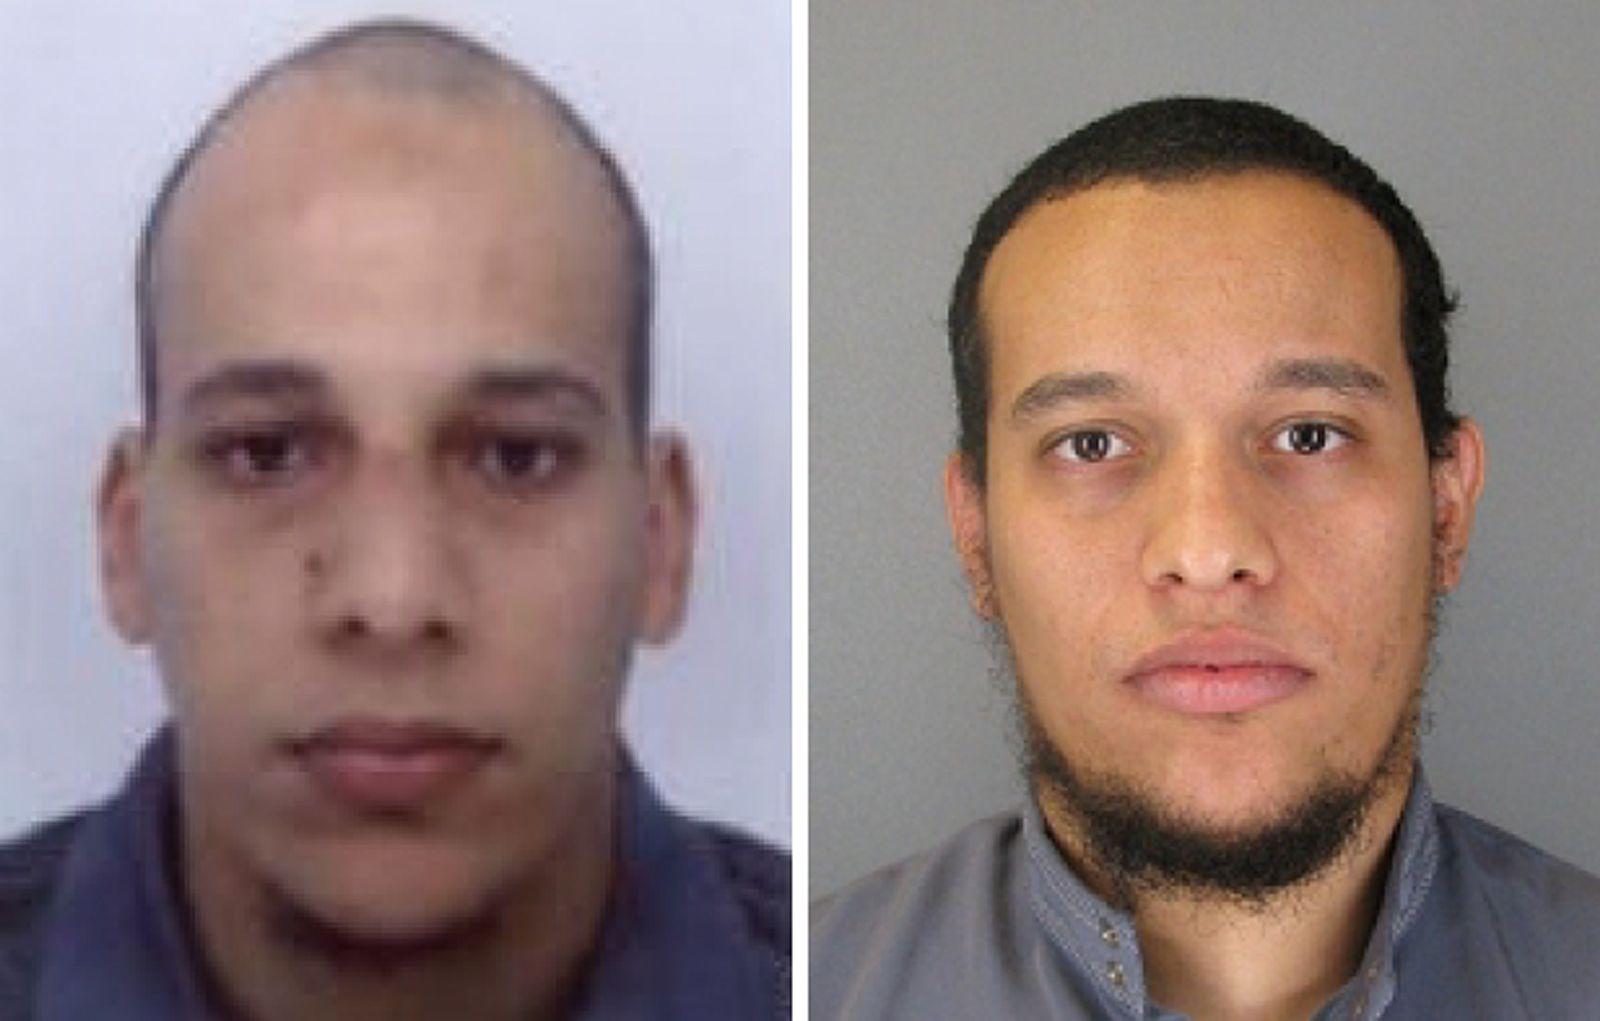 Cherif Kouachi / Said Kouachi/ Al-Qaida